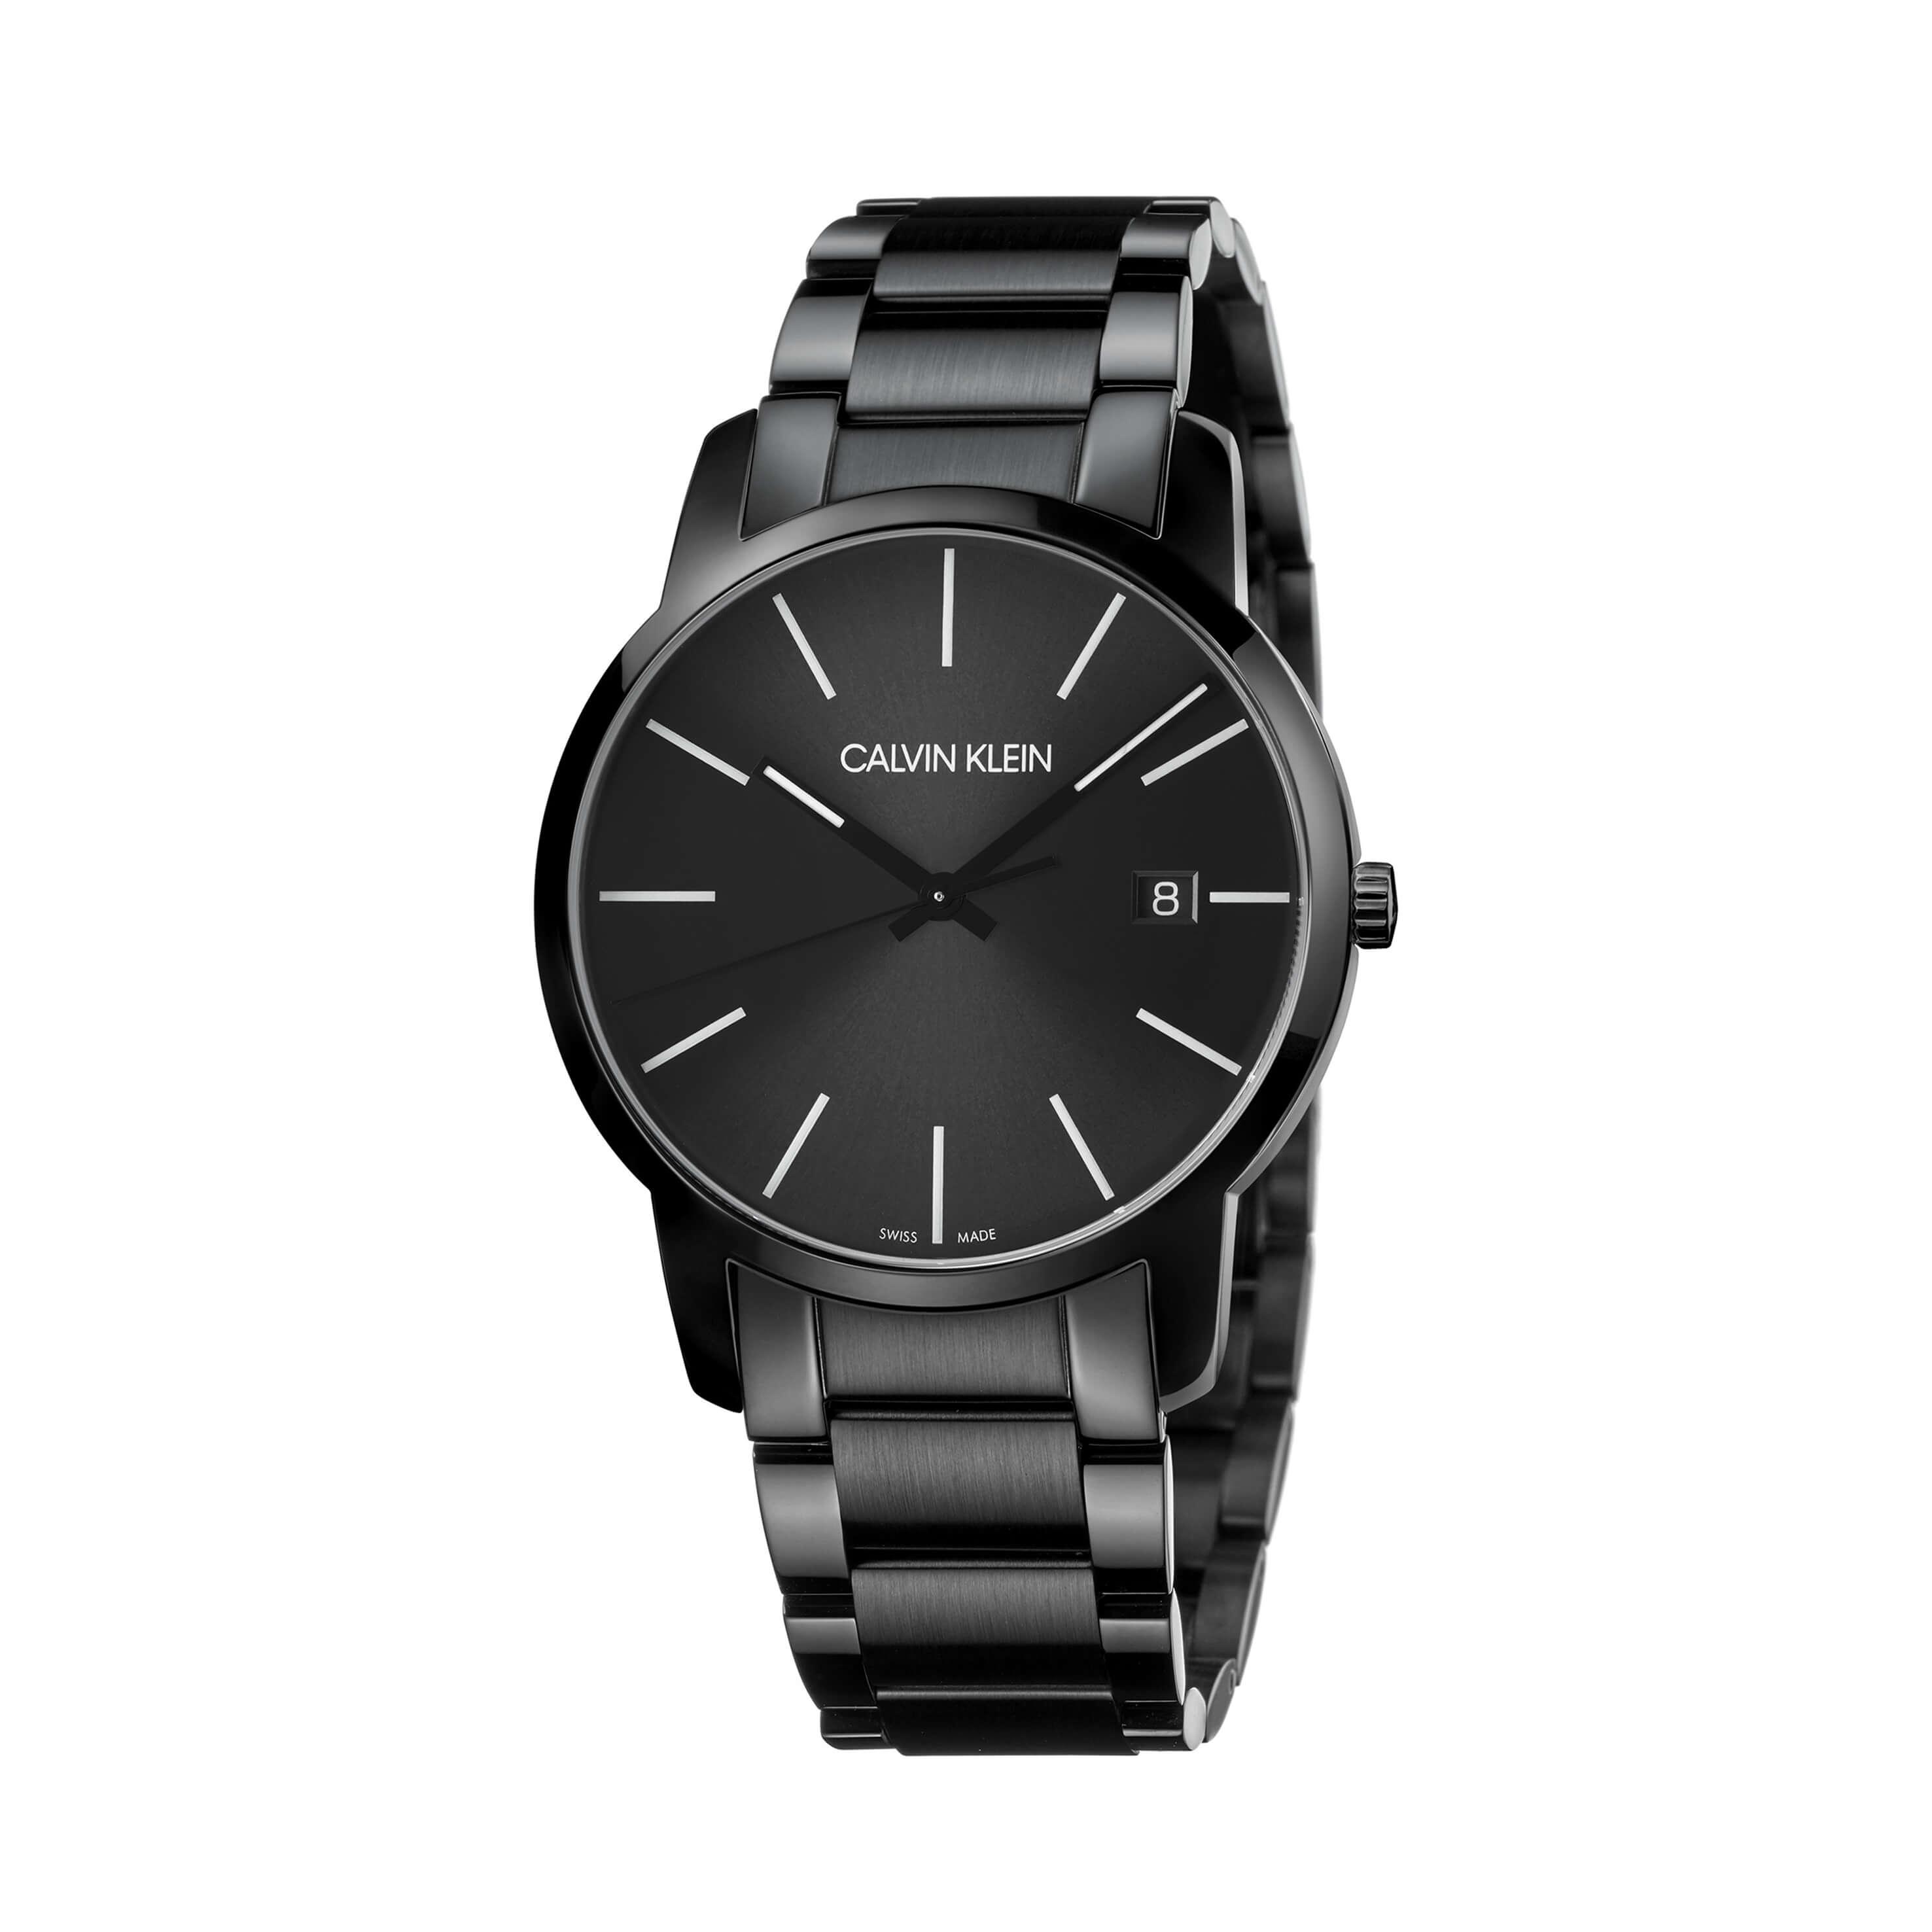 CALVIN KLEIN FW19 Horloges